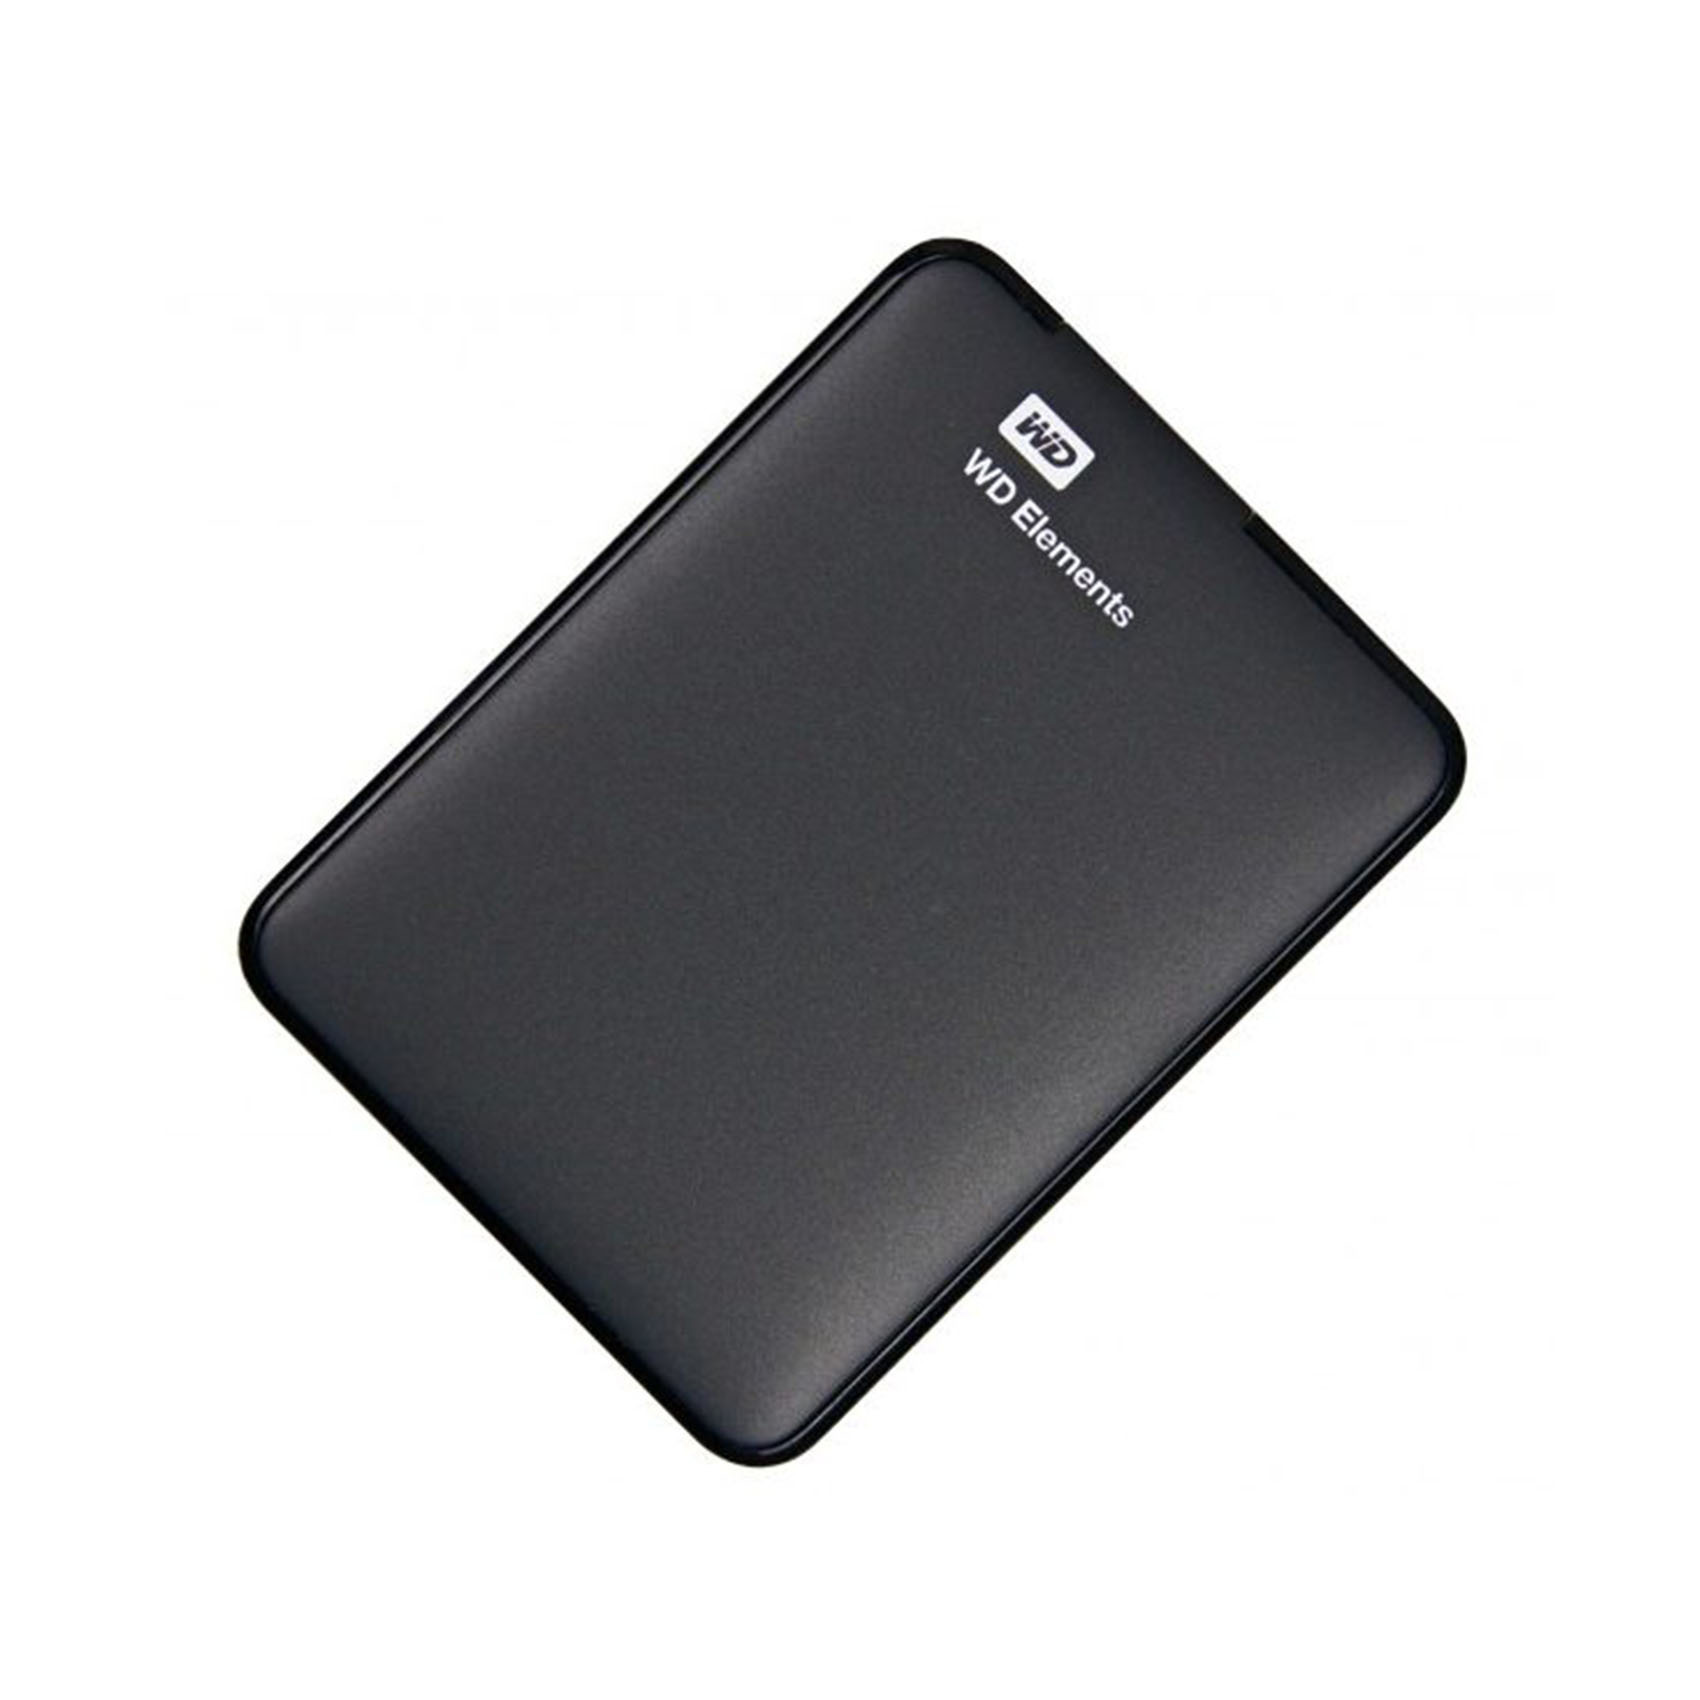 Buy Western Digital Elements Portable Hard Drive 1tb Usb 30 Black Hardisk External Wd Ext Hdd Blk